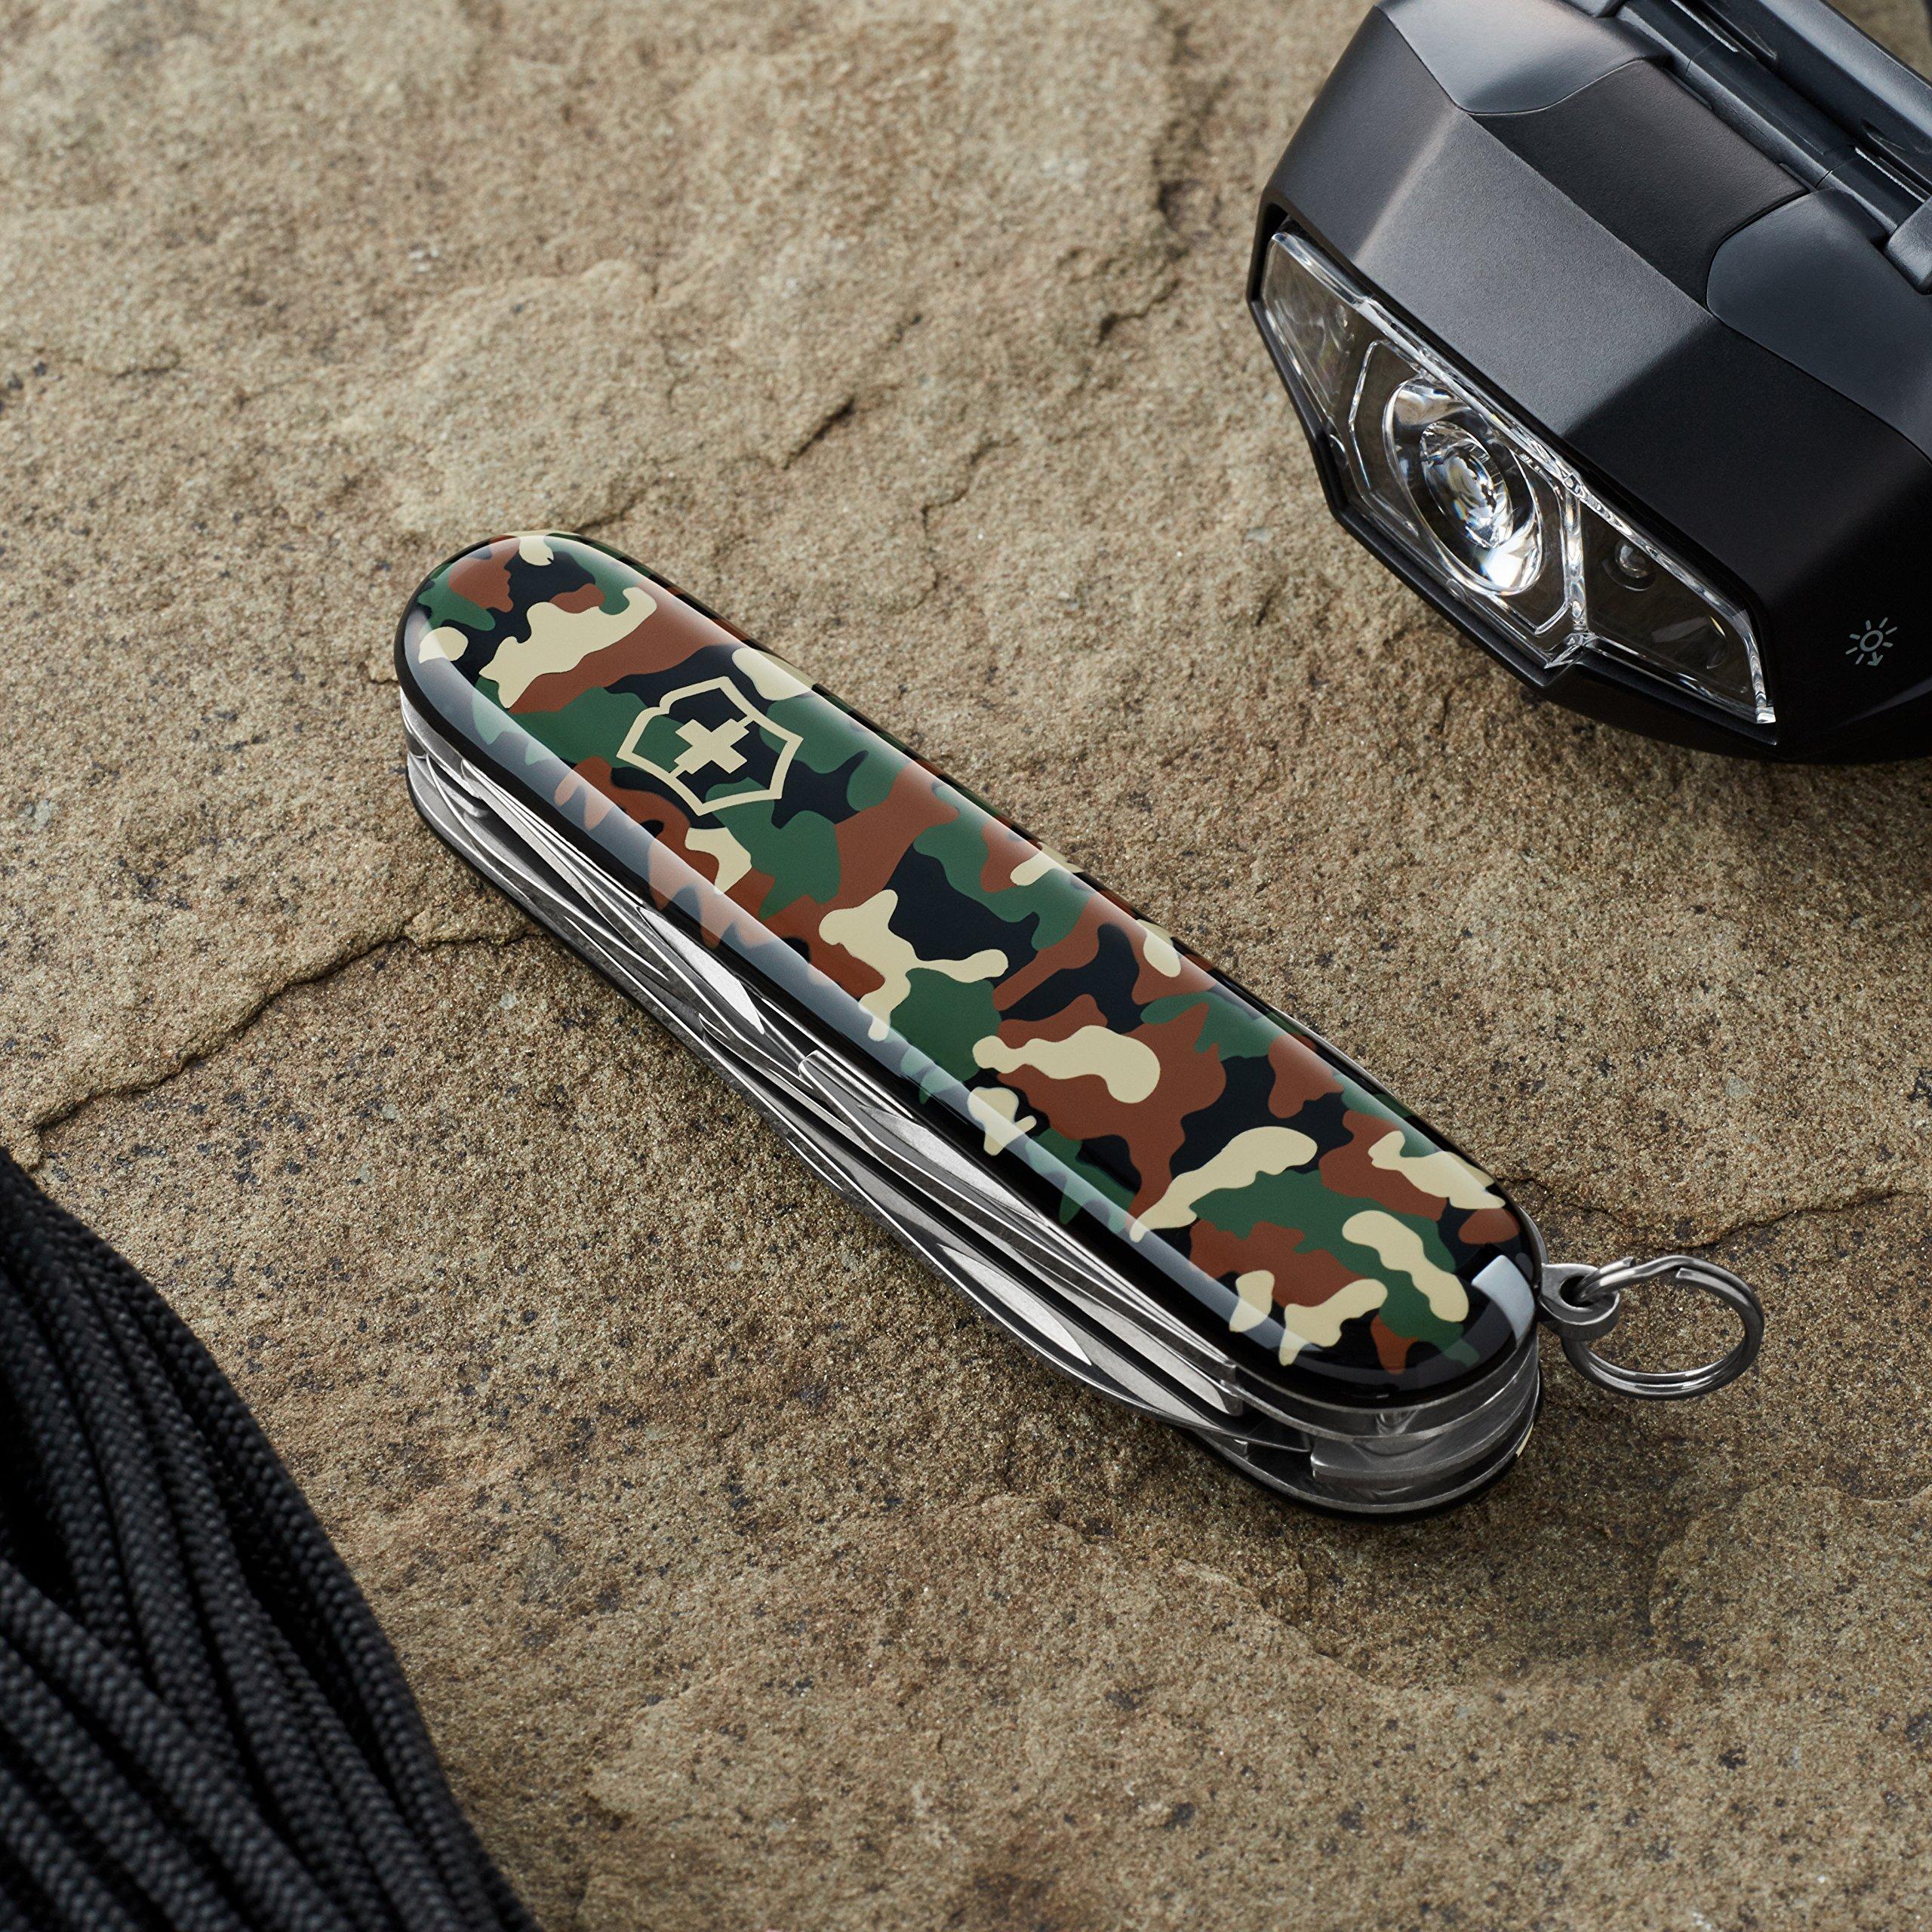 Victorinox Swiss Army Climber Pocket Knife, Camouflage, 91mm